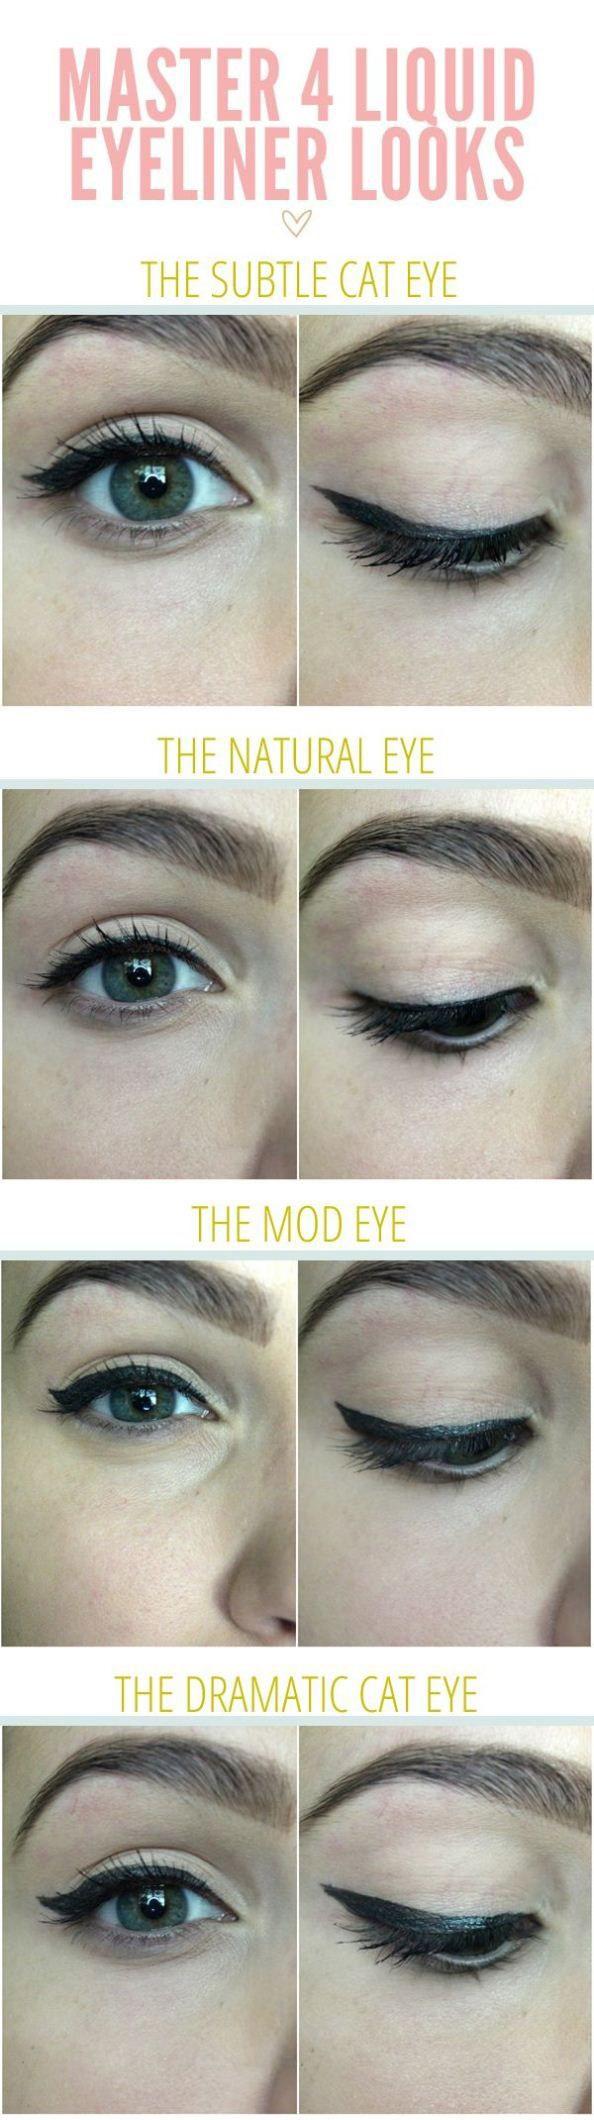 how-to-apply-liquid-eyeliner-step-by-step-tutorial-4